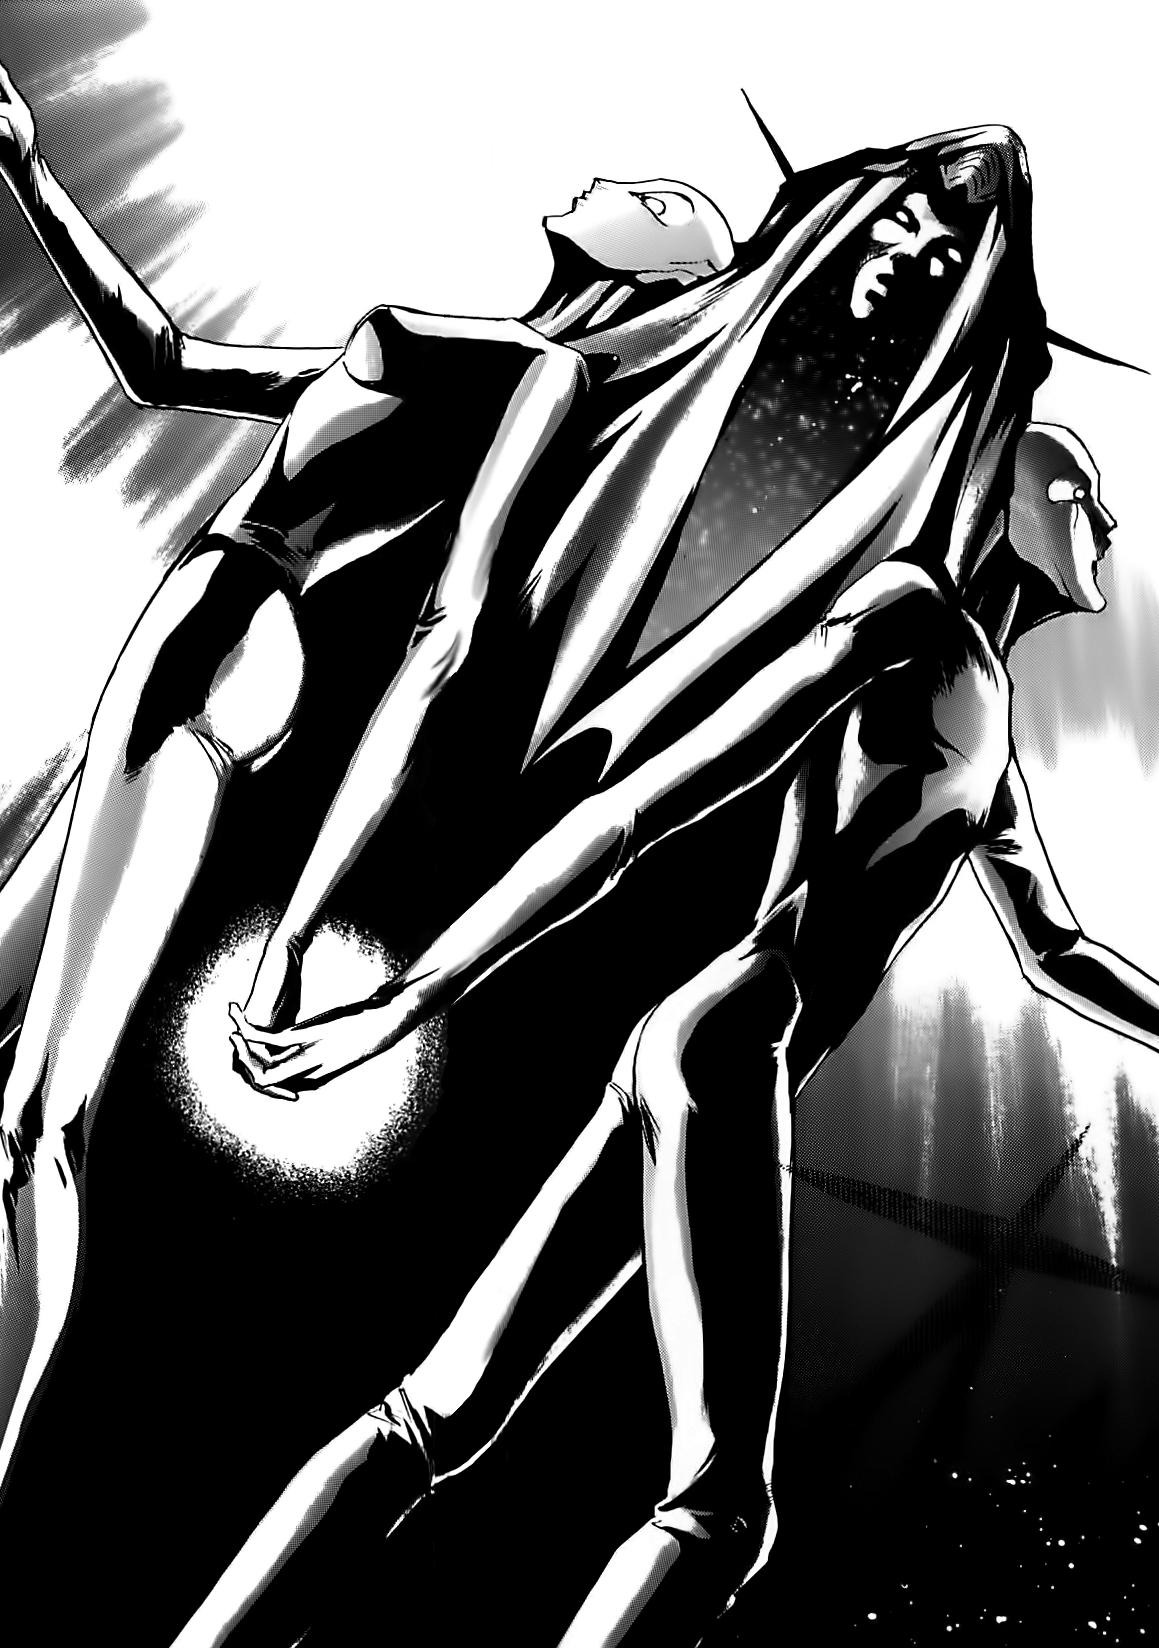 Nyx megami tensei wiki fandom powered by wikia the night queen as she appears in the megami ibunroku persona manga biocorpaavc